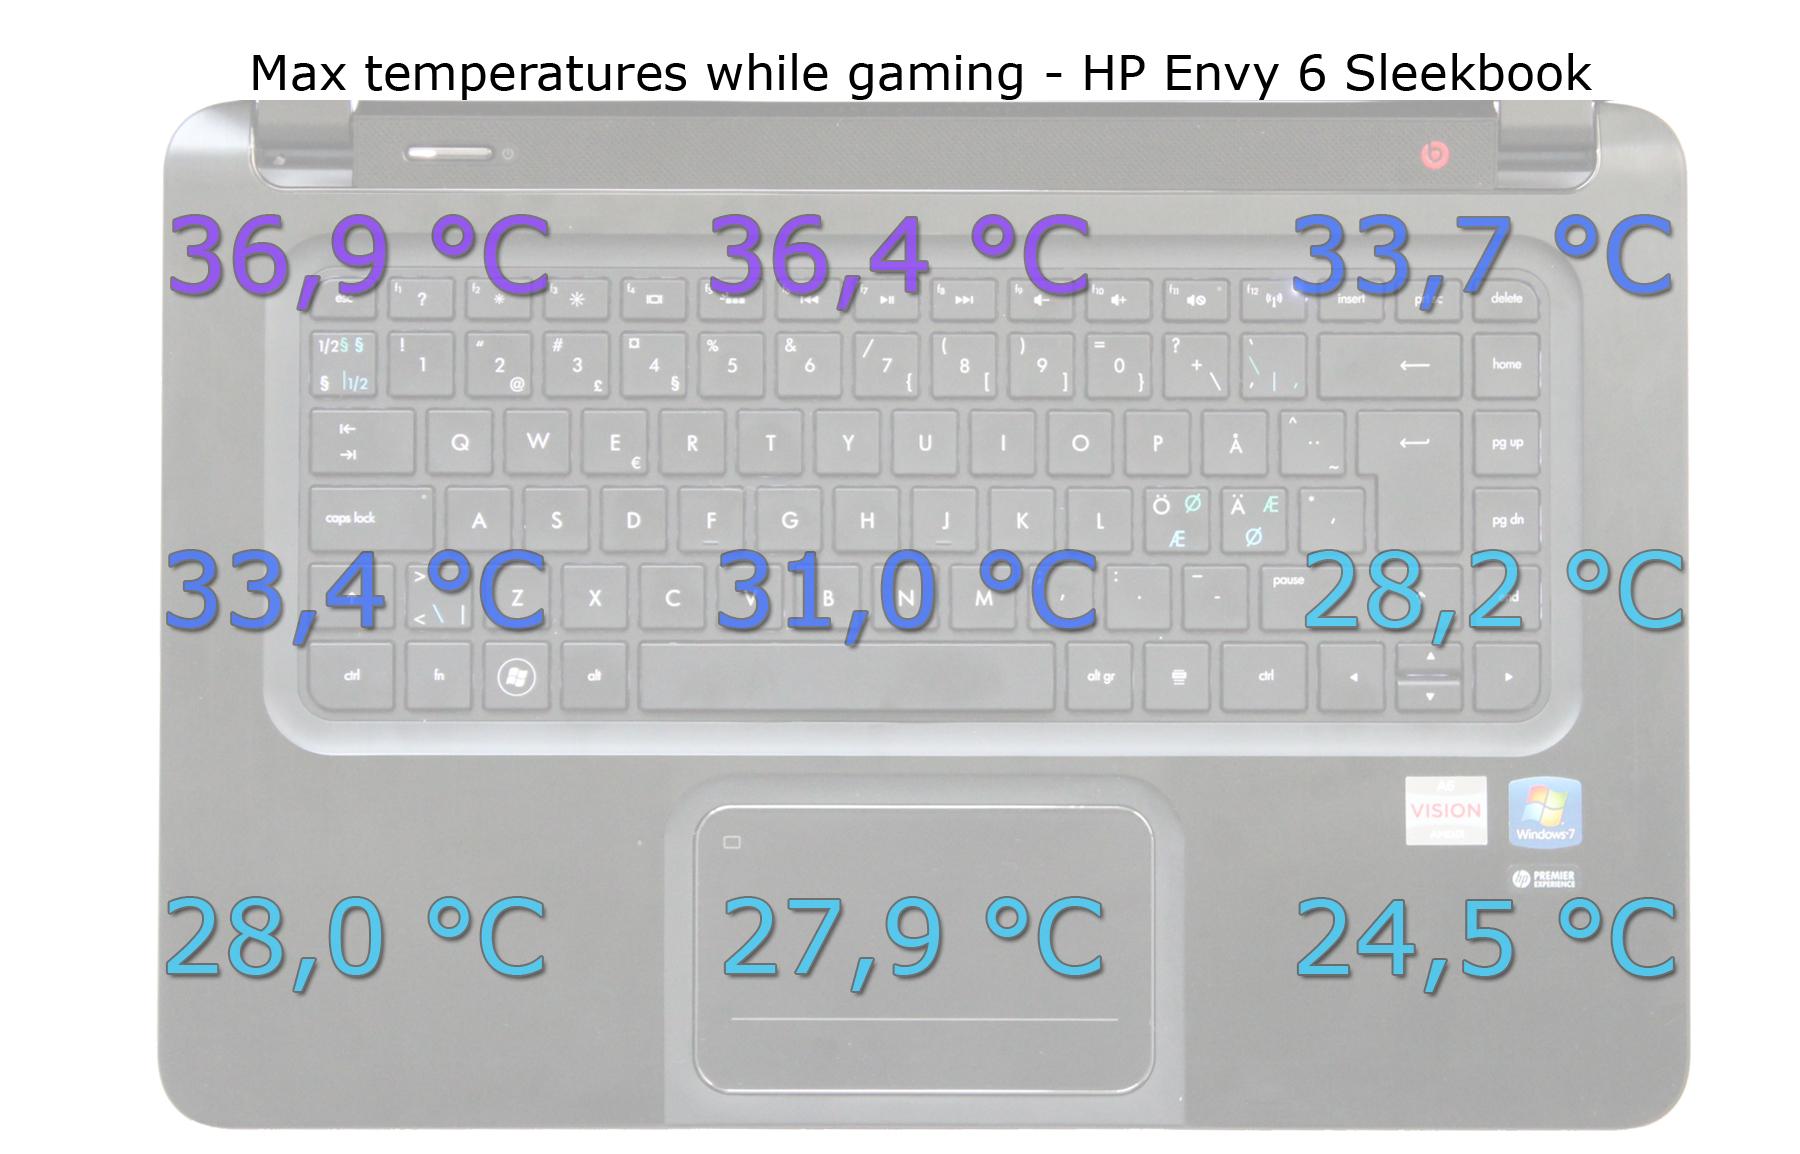 HP_Envy_6_Temp3